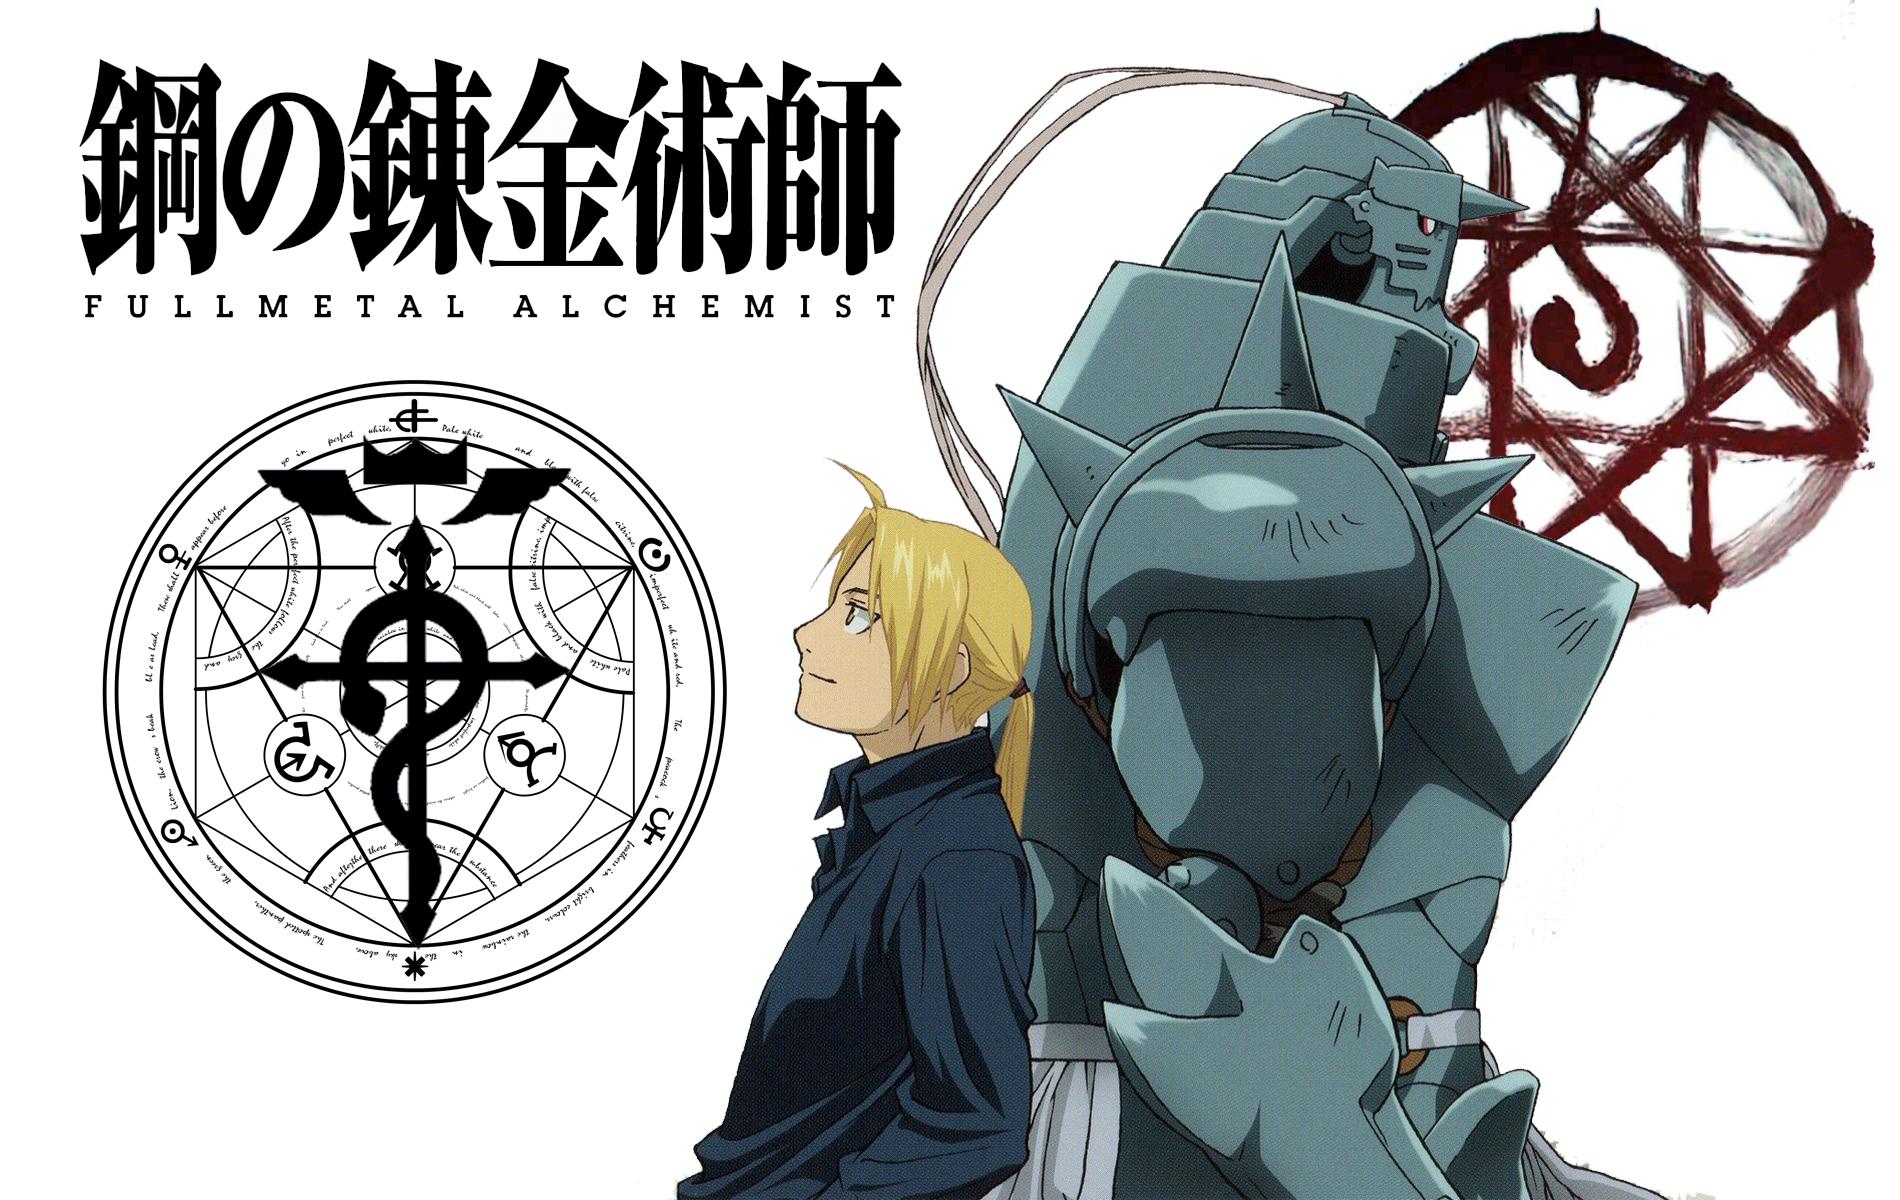 77+ Fullmetal Alchemist Brotherhood Wallpaper on ...